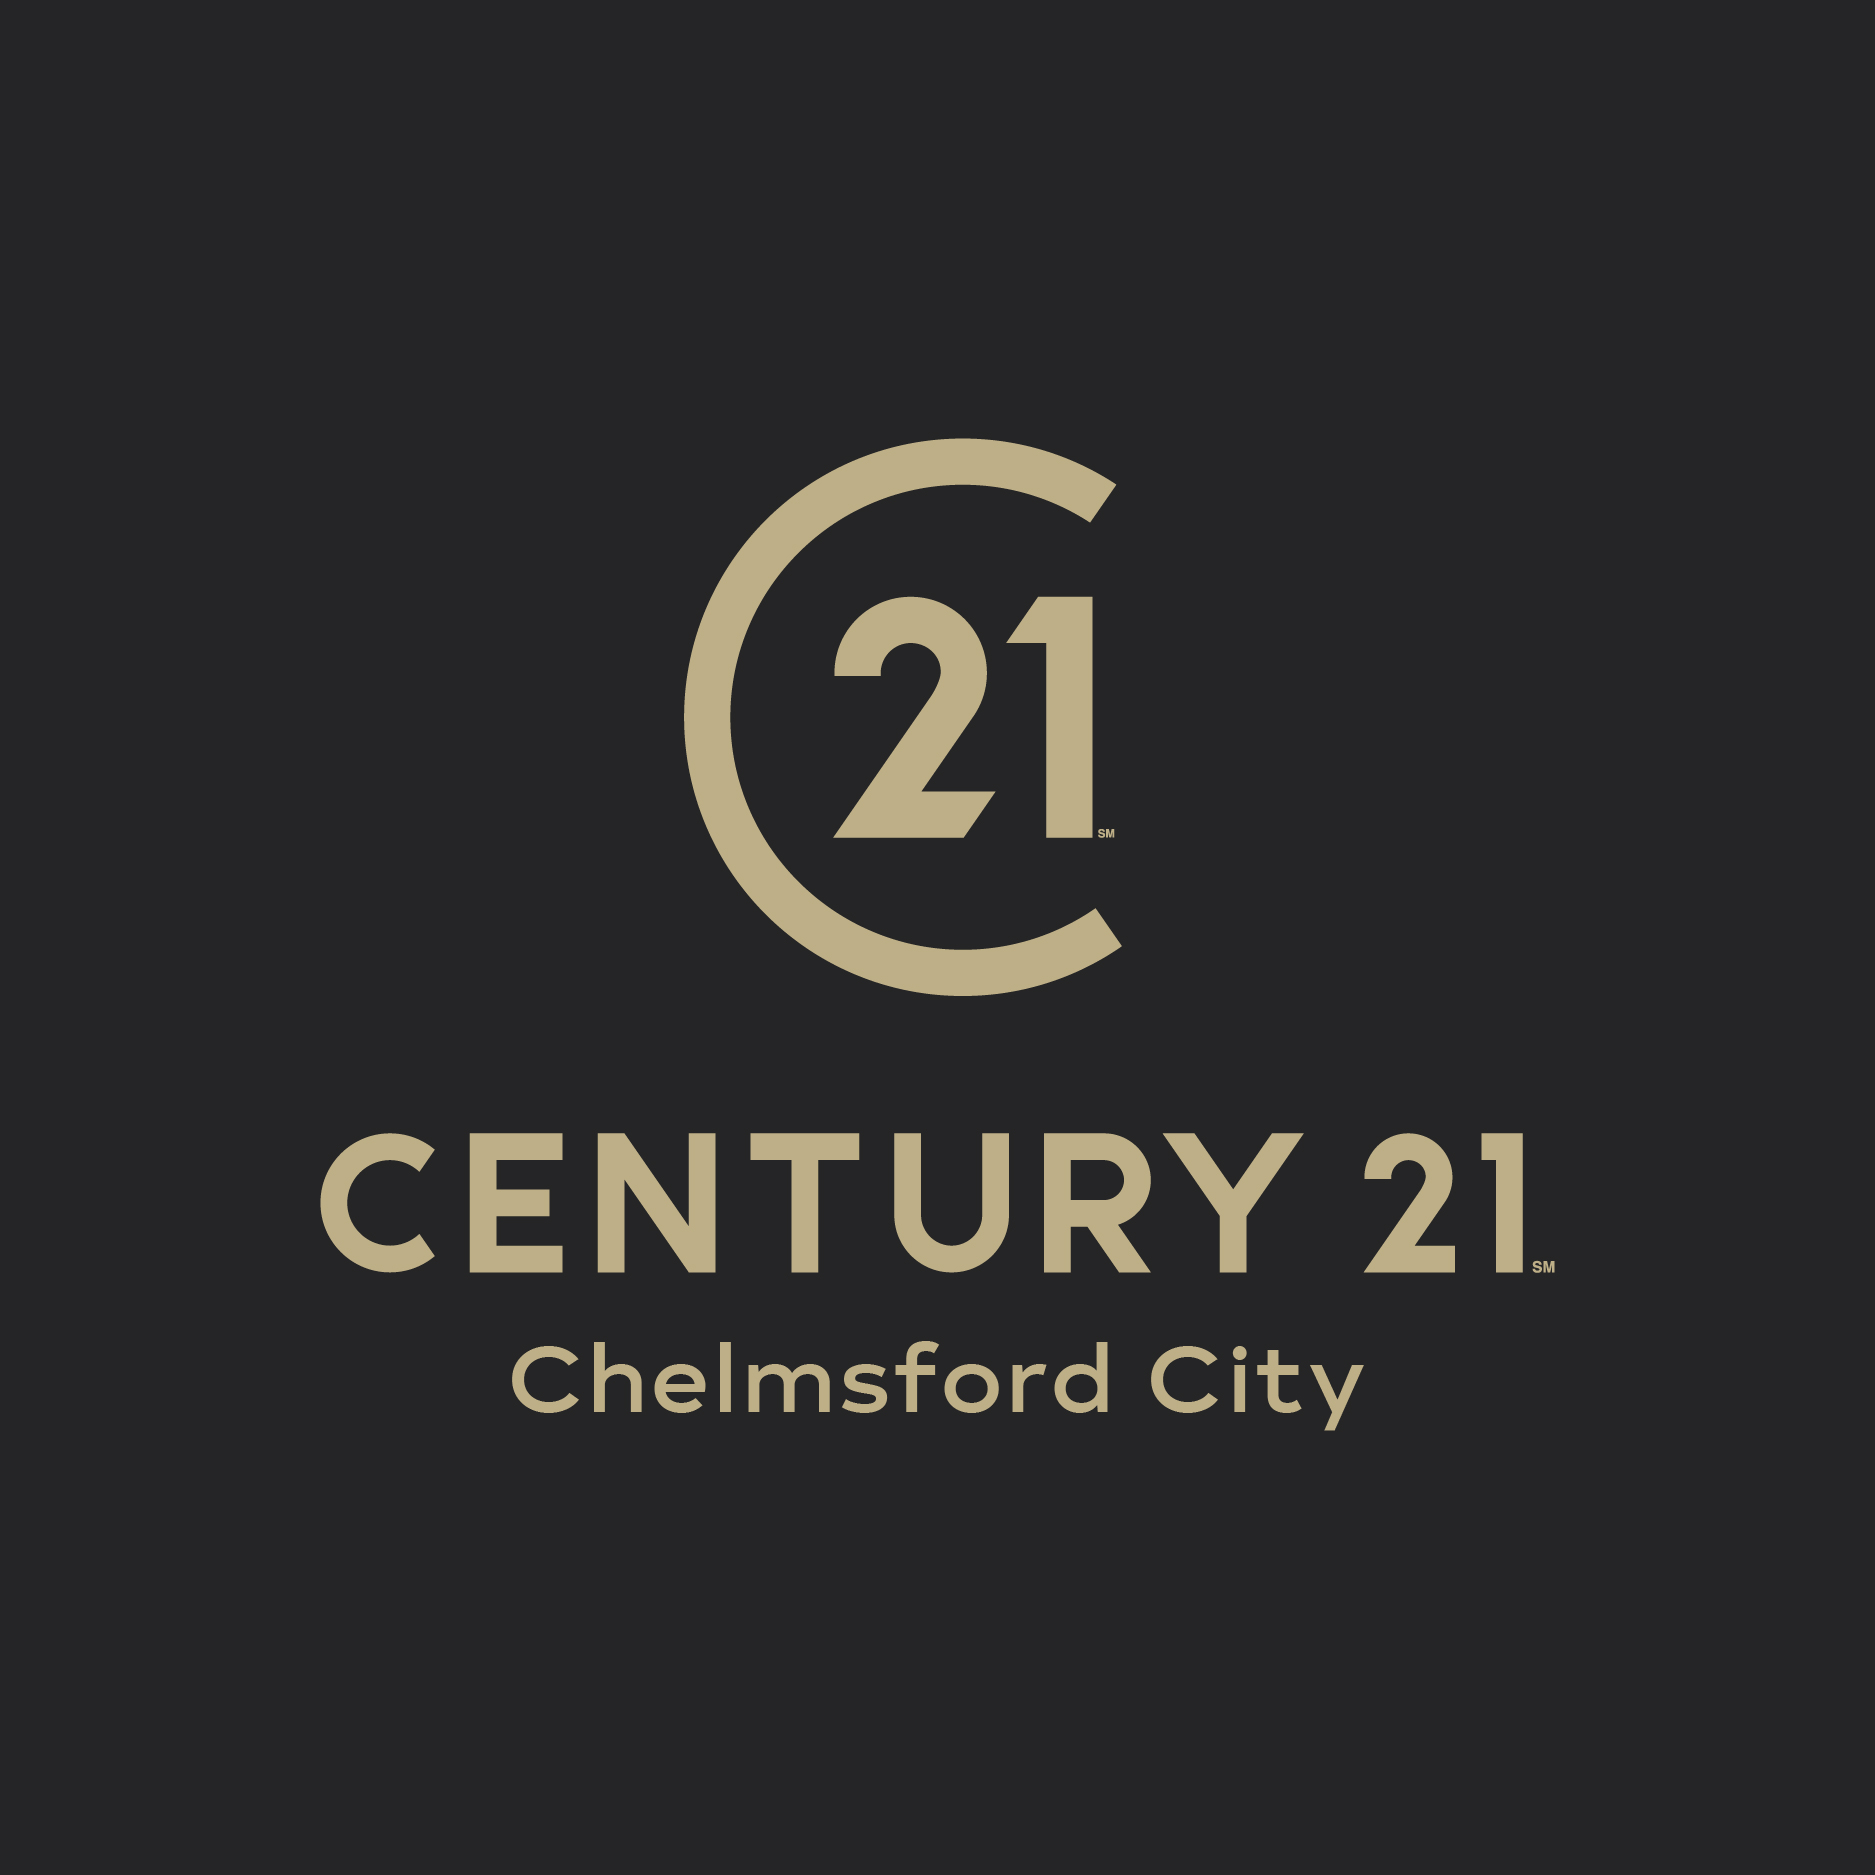 Century 21 - Chelmsford City